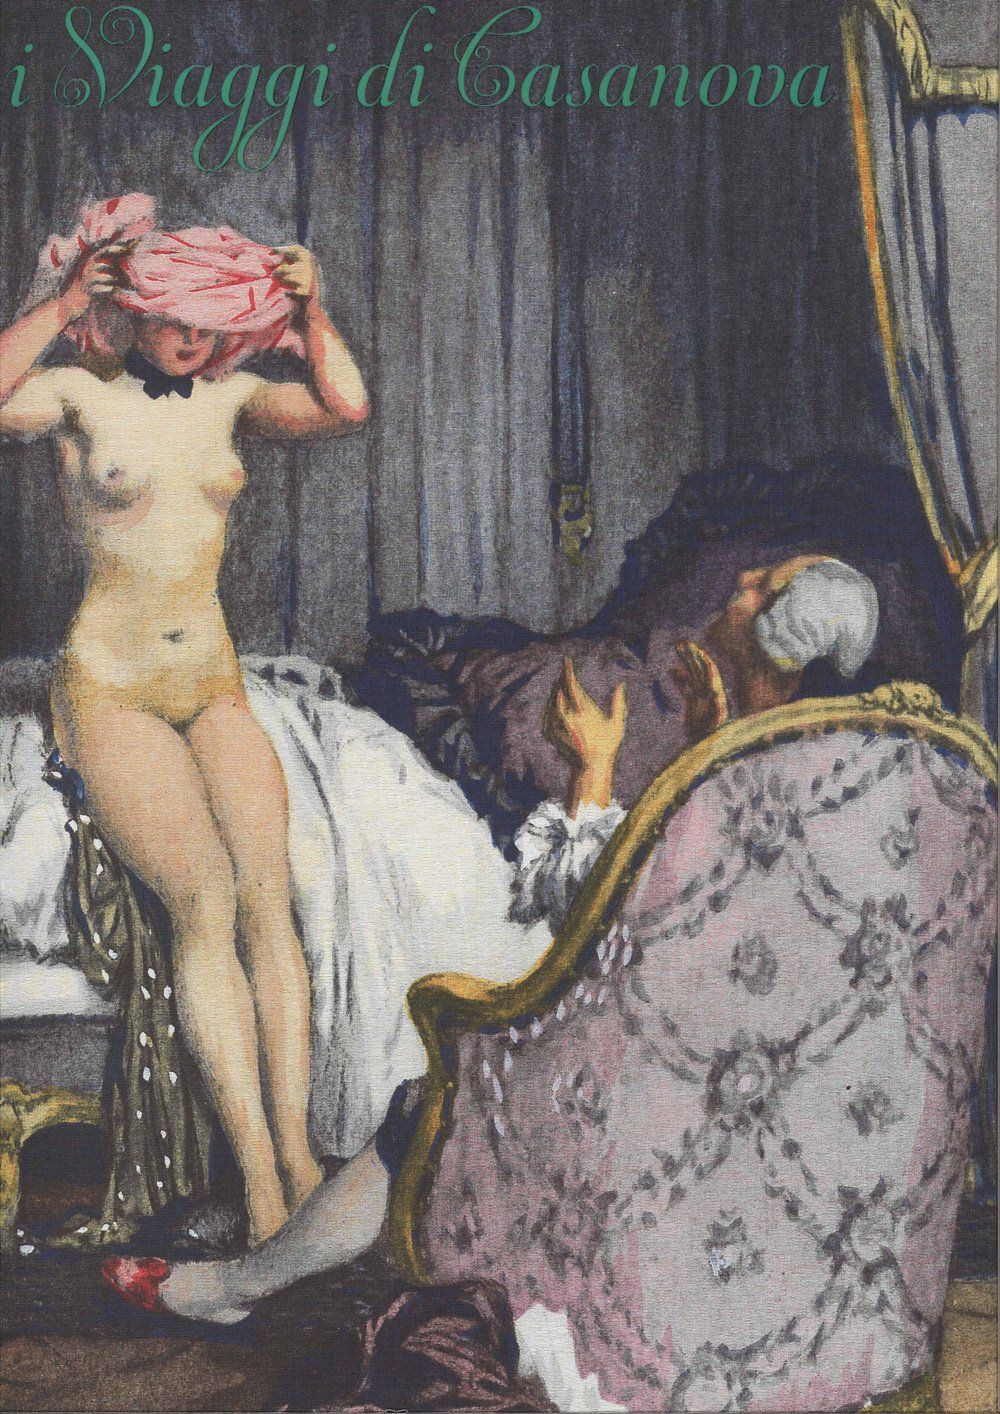 """I viaggi di Giacomo Casanova"": tappa a Porta Portese!"